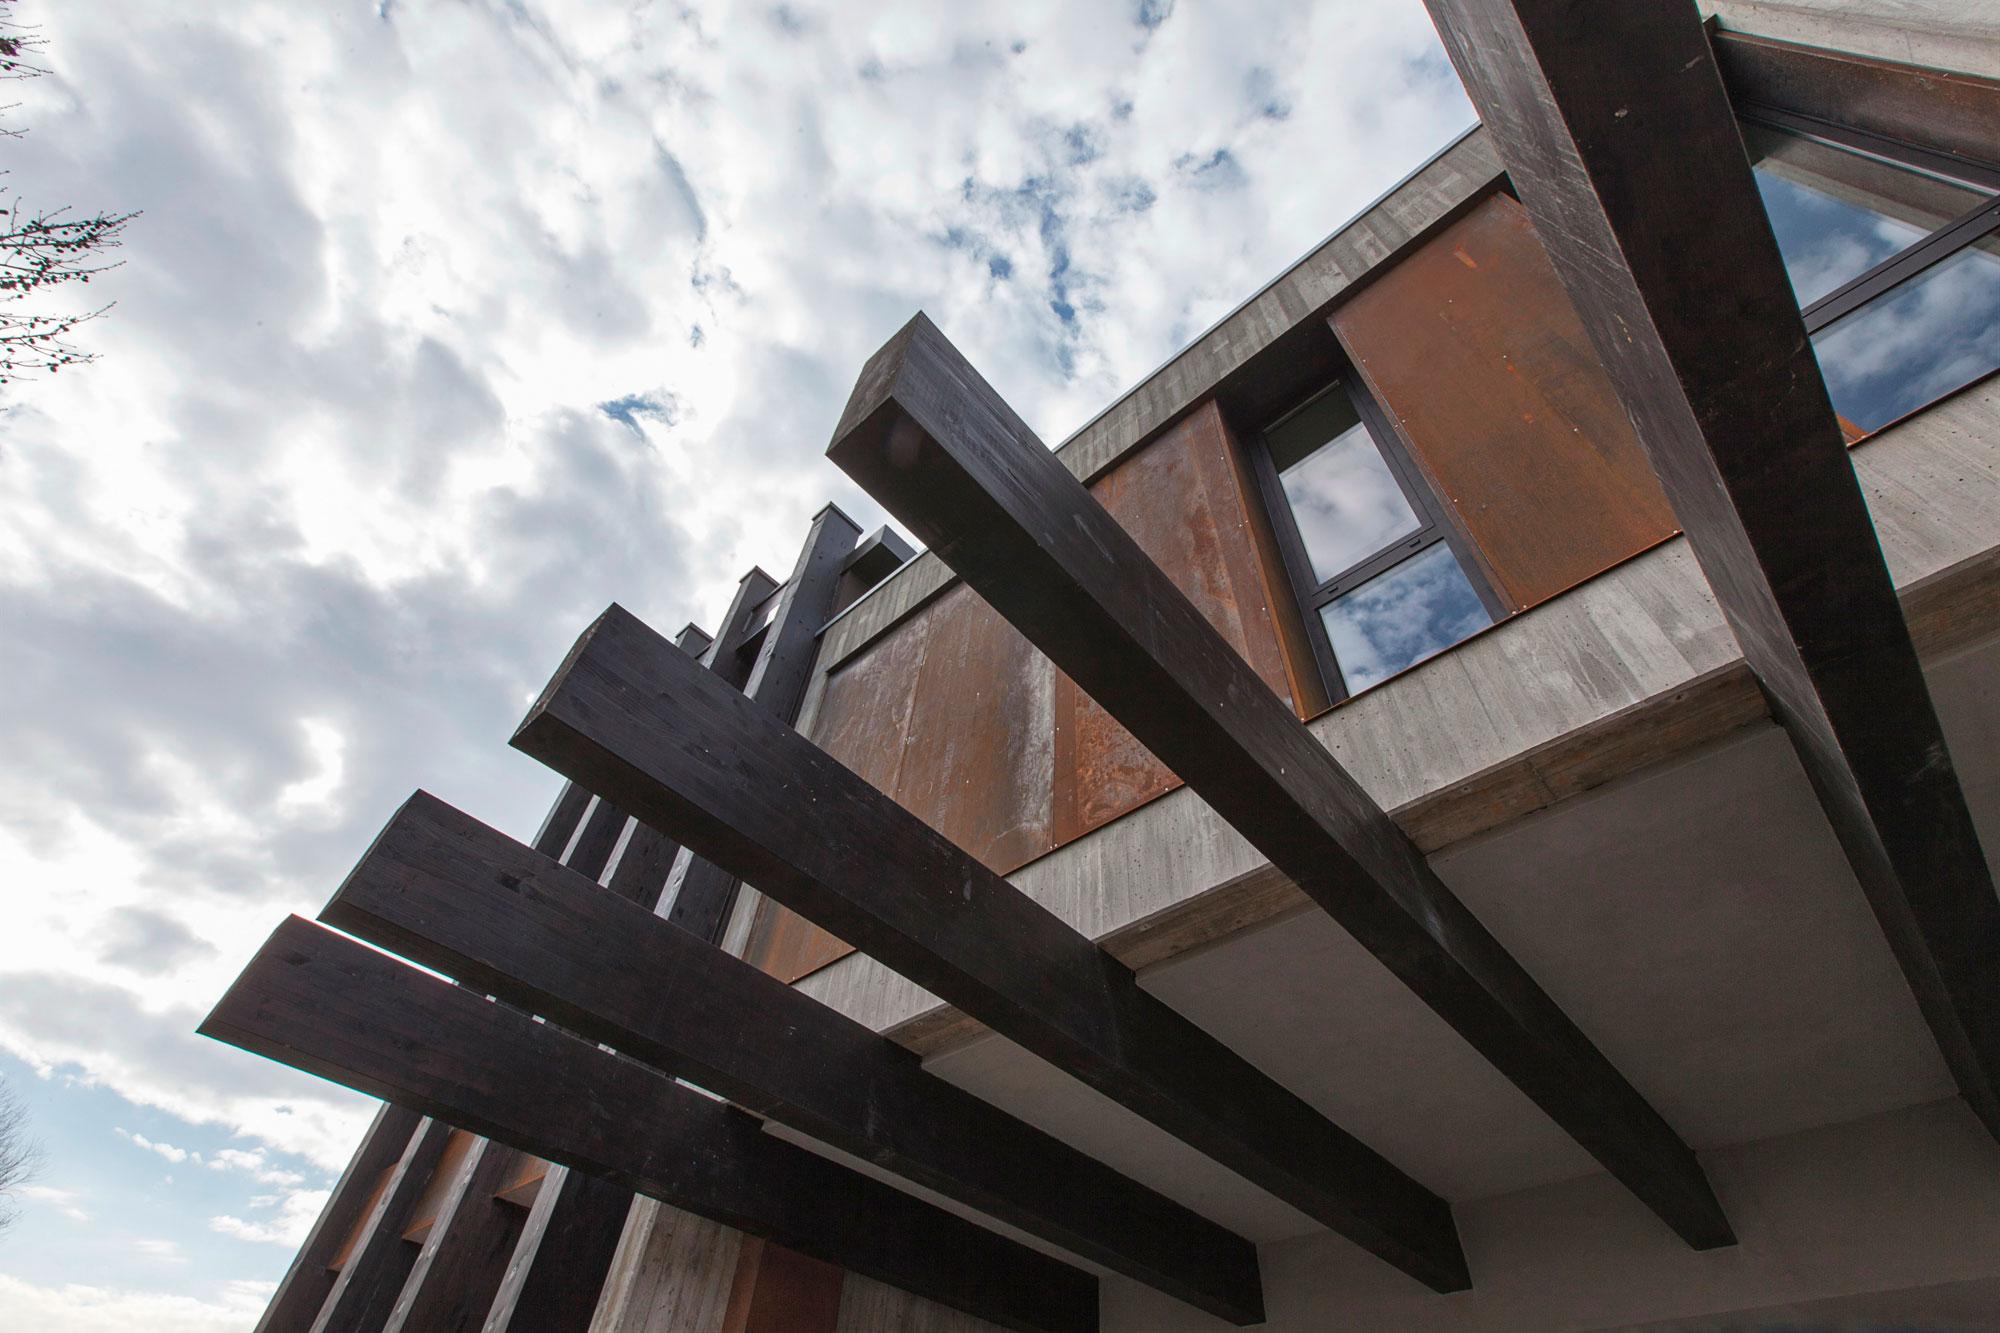 D'Autore Residence near Bologna by Giraldi Associati Architetti-08